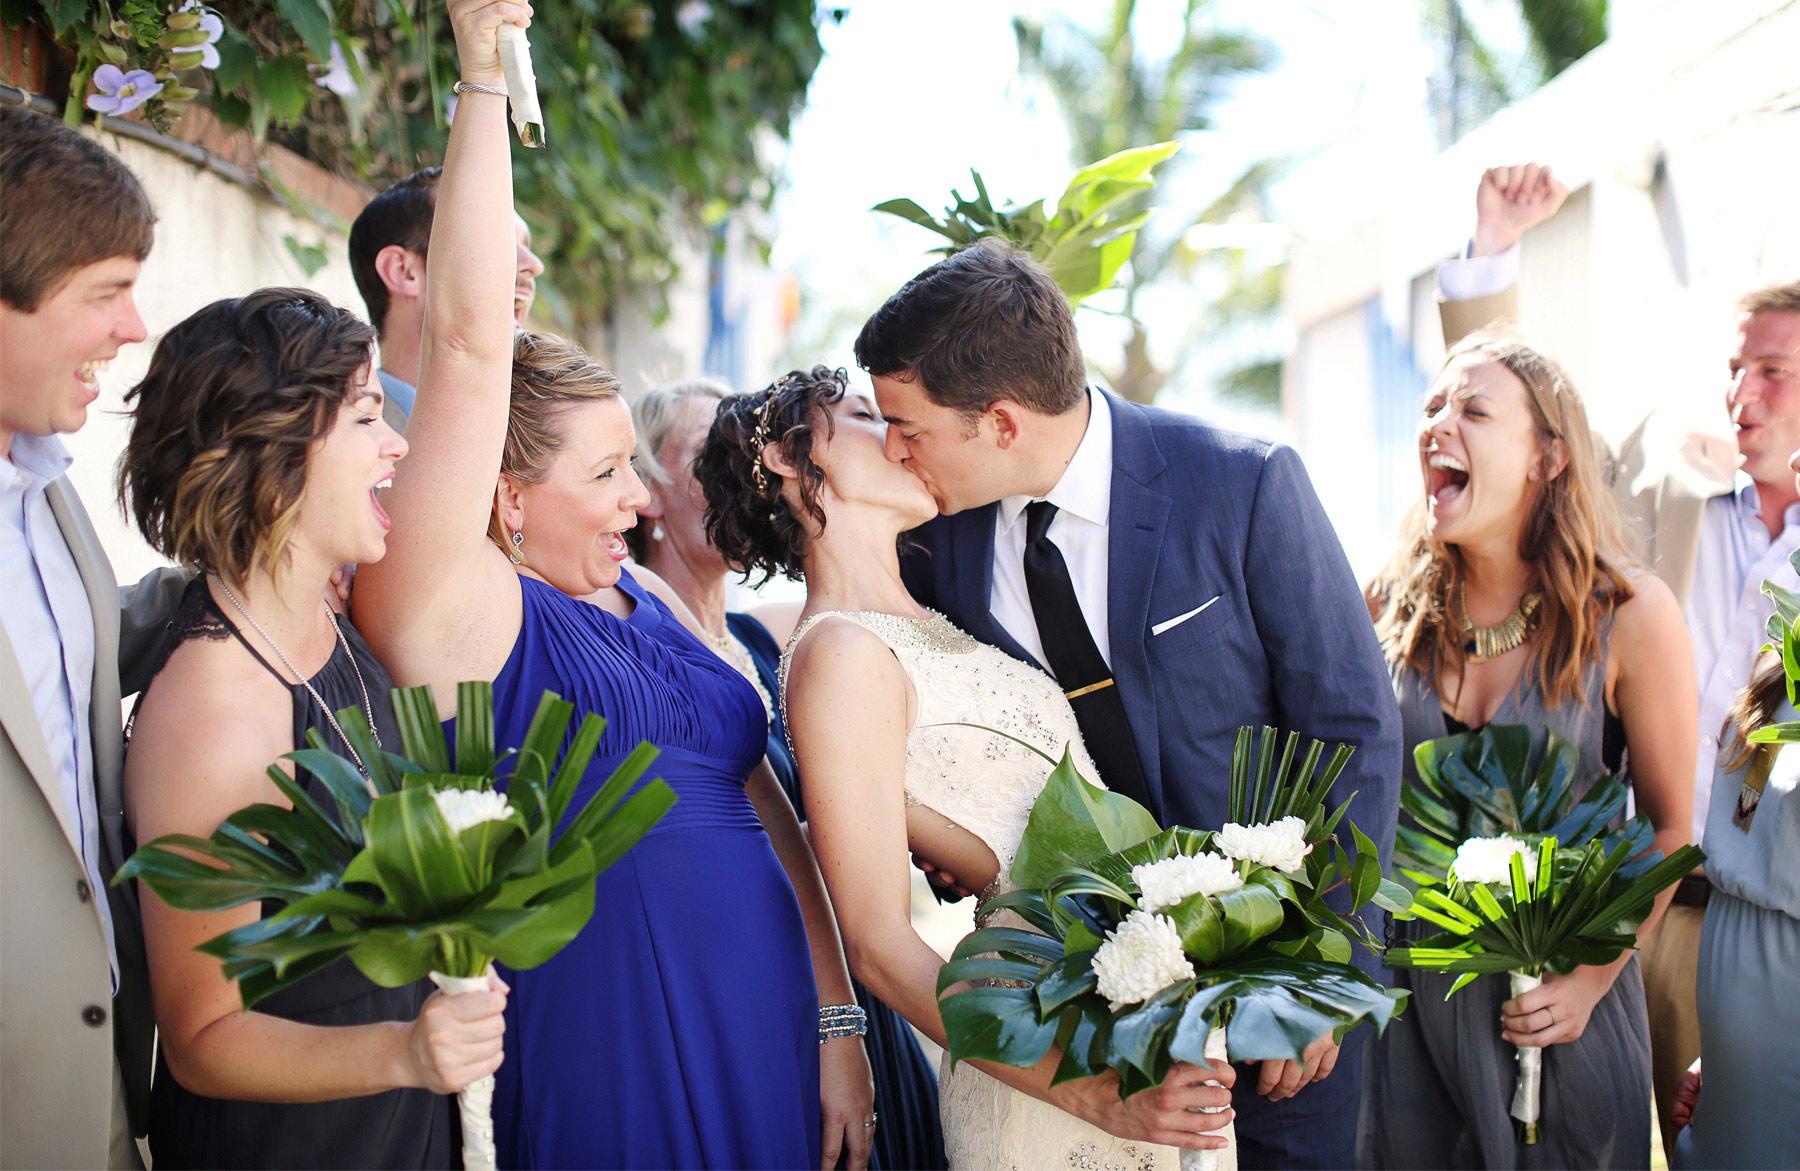 12-Costa-Rica-Wedding-Photography-by-Vick-Photography-Jaco-Tropical-Beach-Villa-Caletas-Resort-Wedding-Party-Group-Alli-and-Duncan.jpg